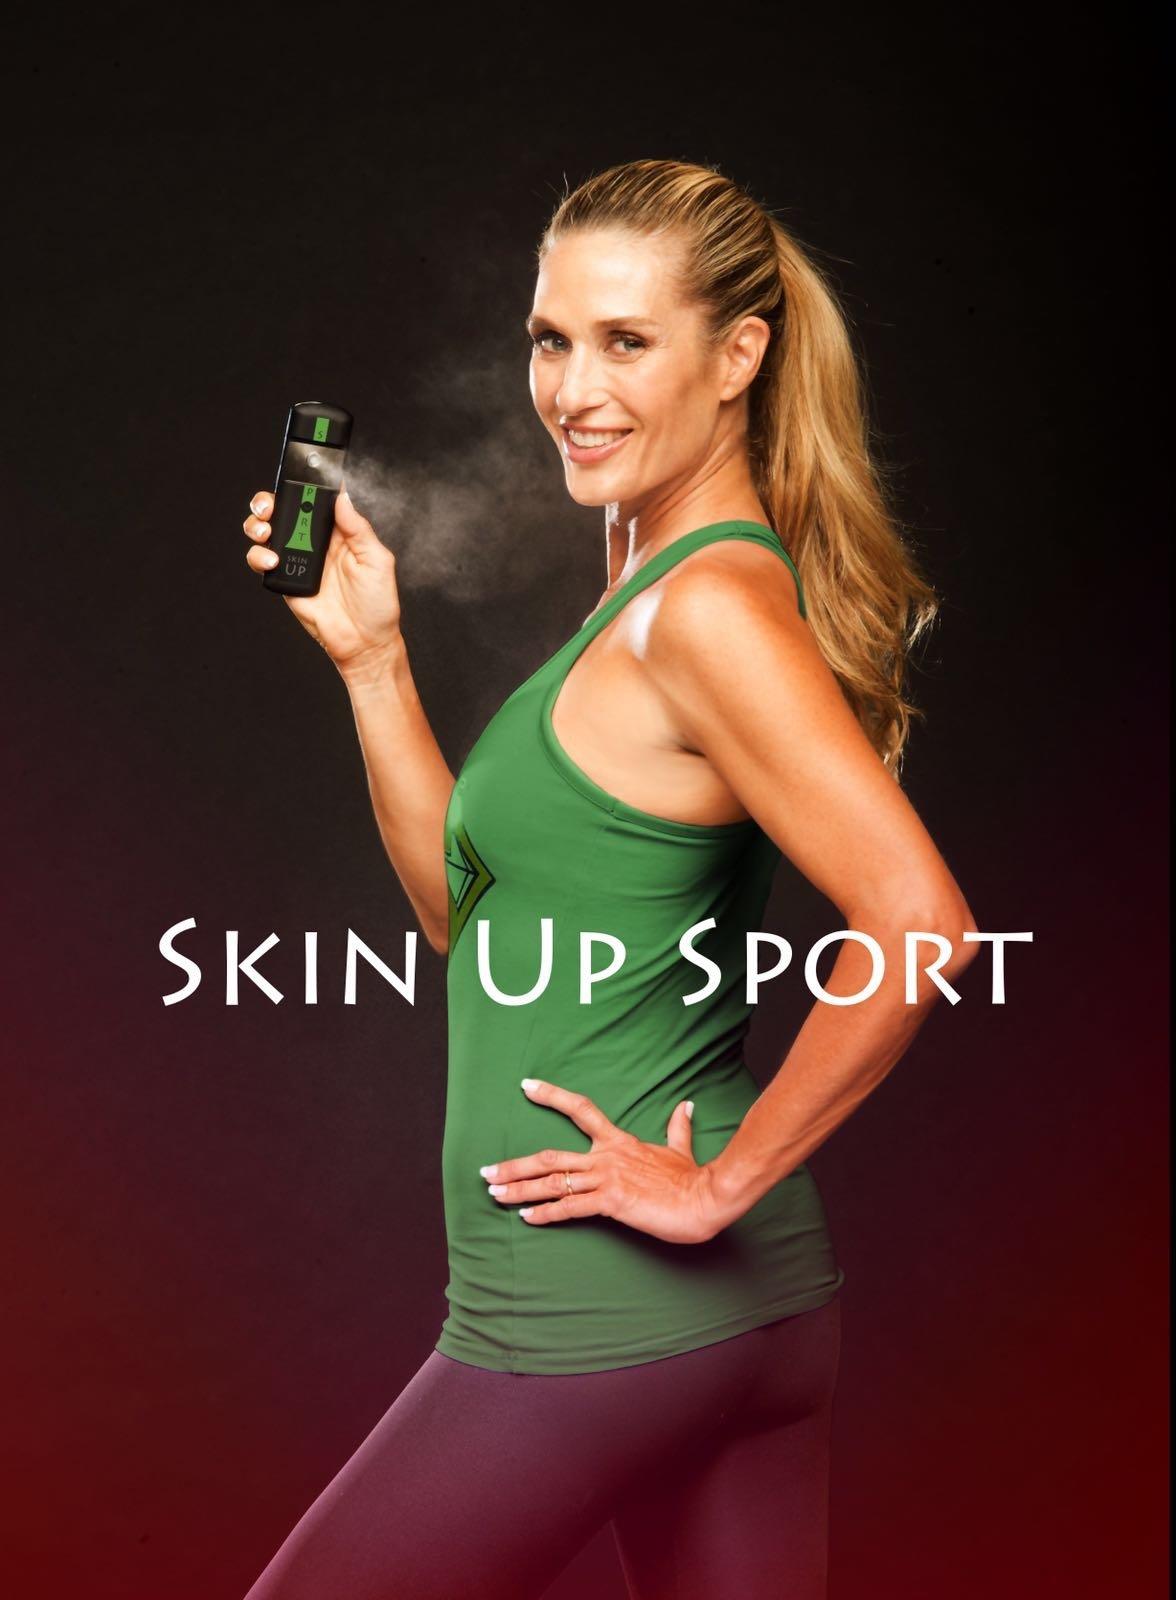 Skin Up Sport